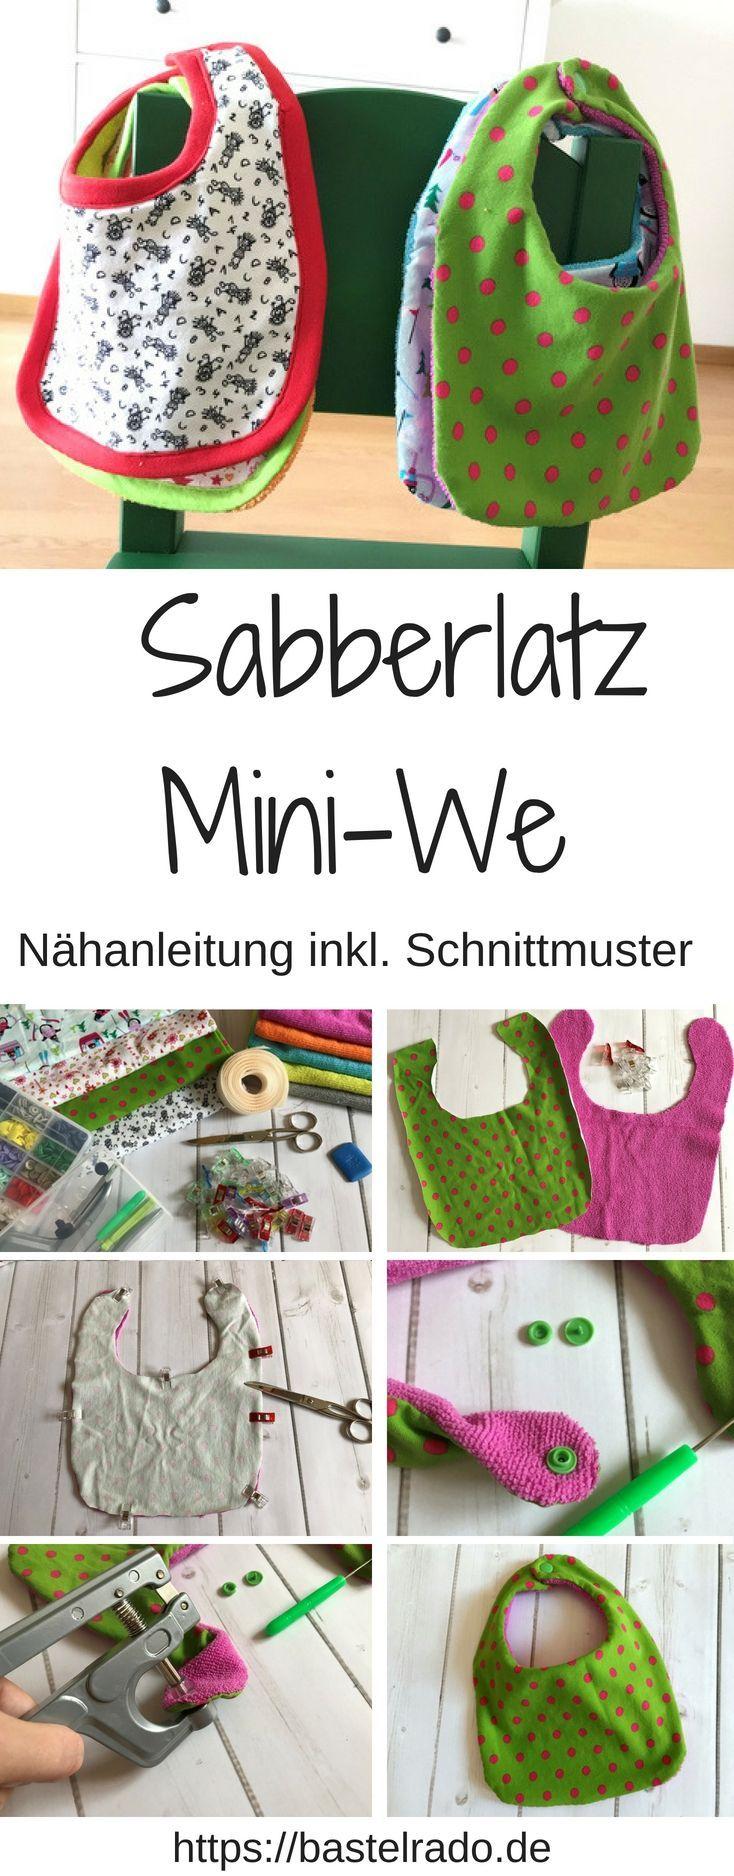 Sabberlatz Mini-We – Nähanleitung inkl. Schnittmuster  – Nachhaltig Leben mit Familie